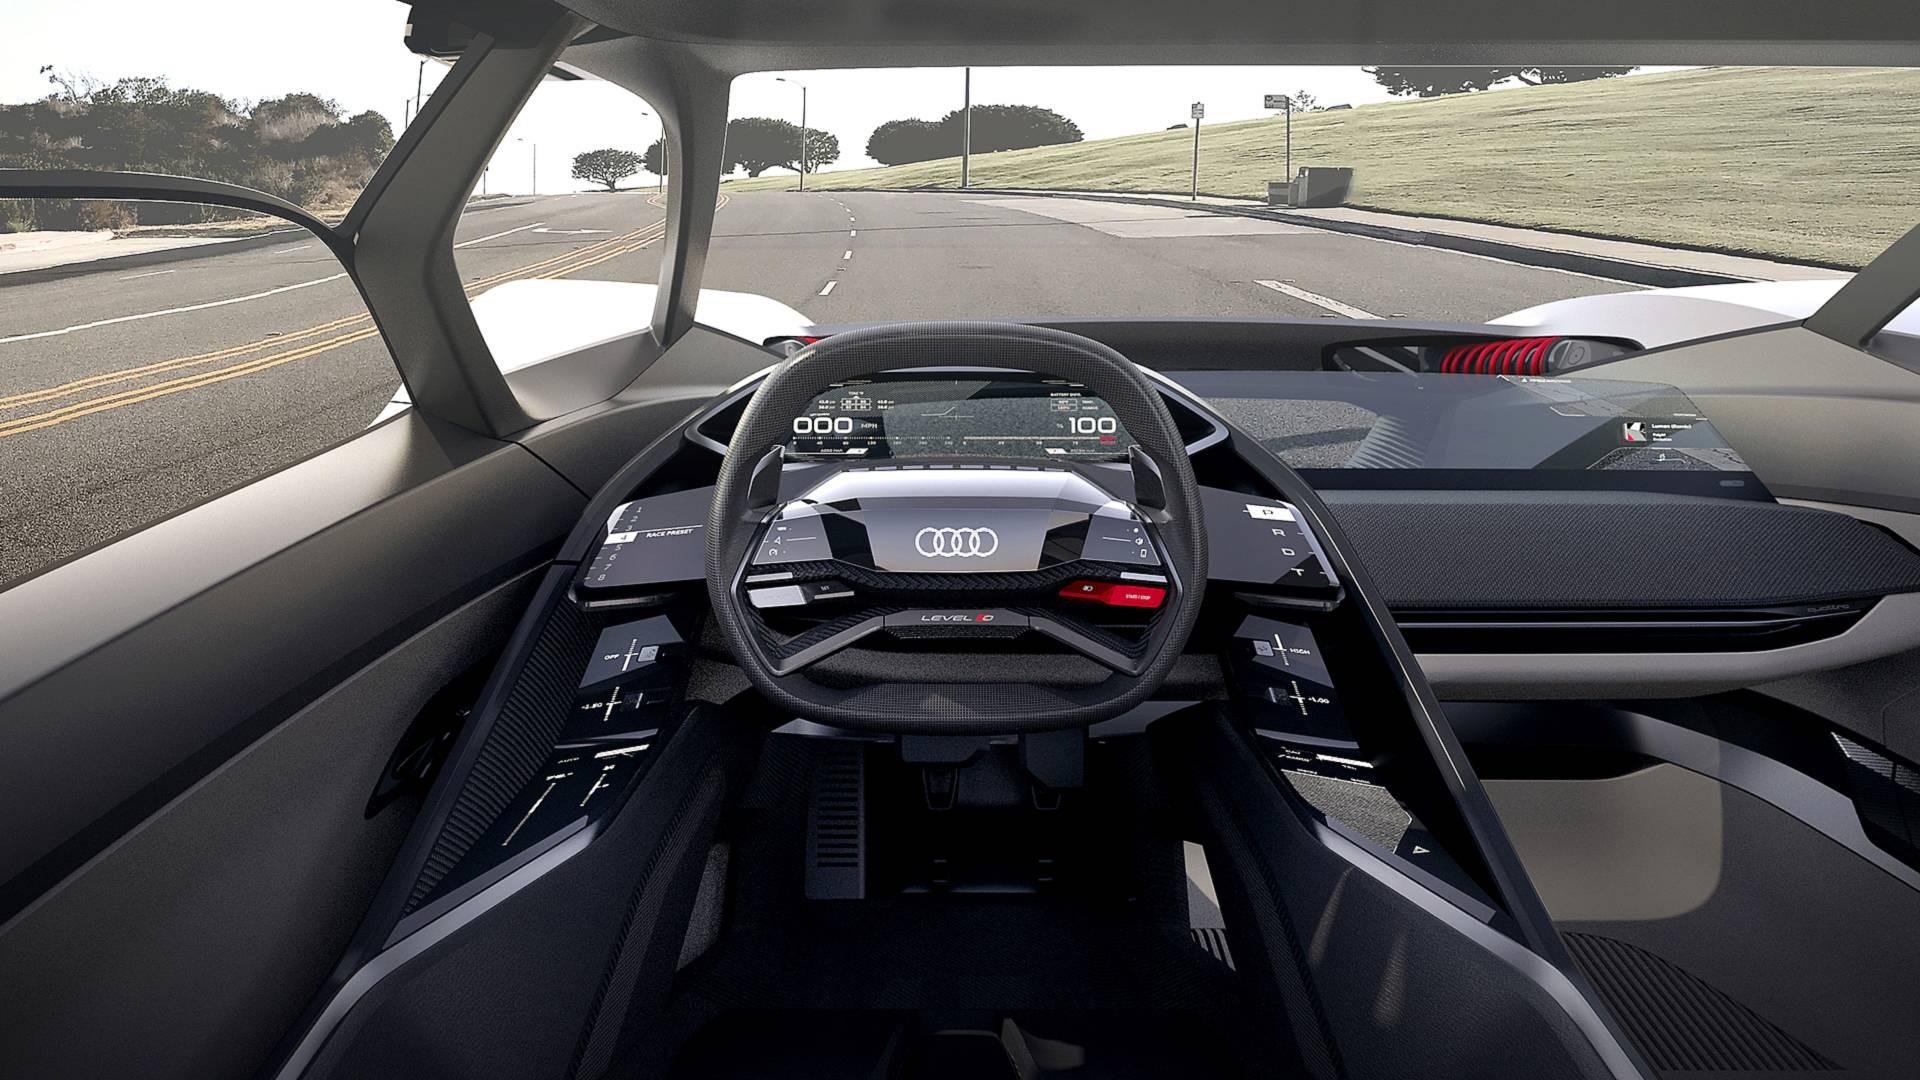 Audi Pb18 E Tron Is A Futuristic Concept Made For The